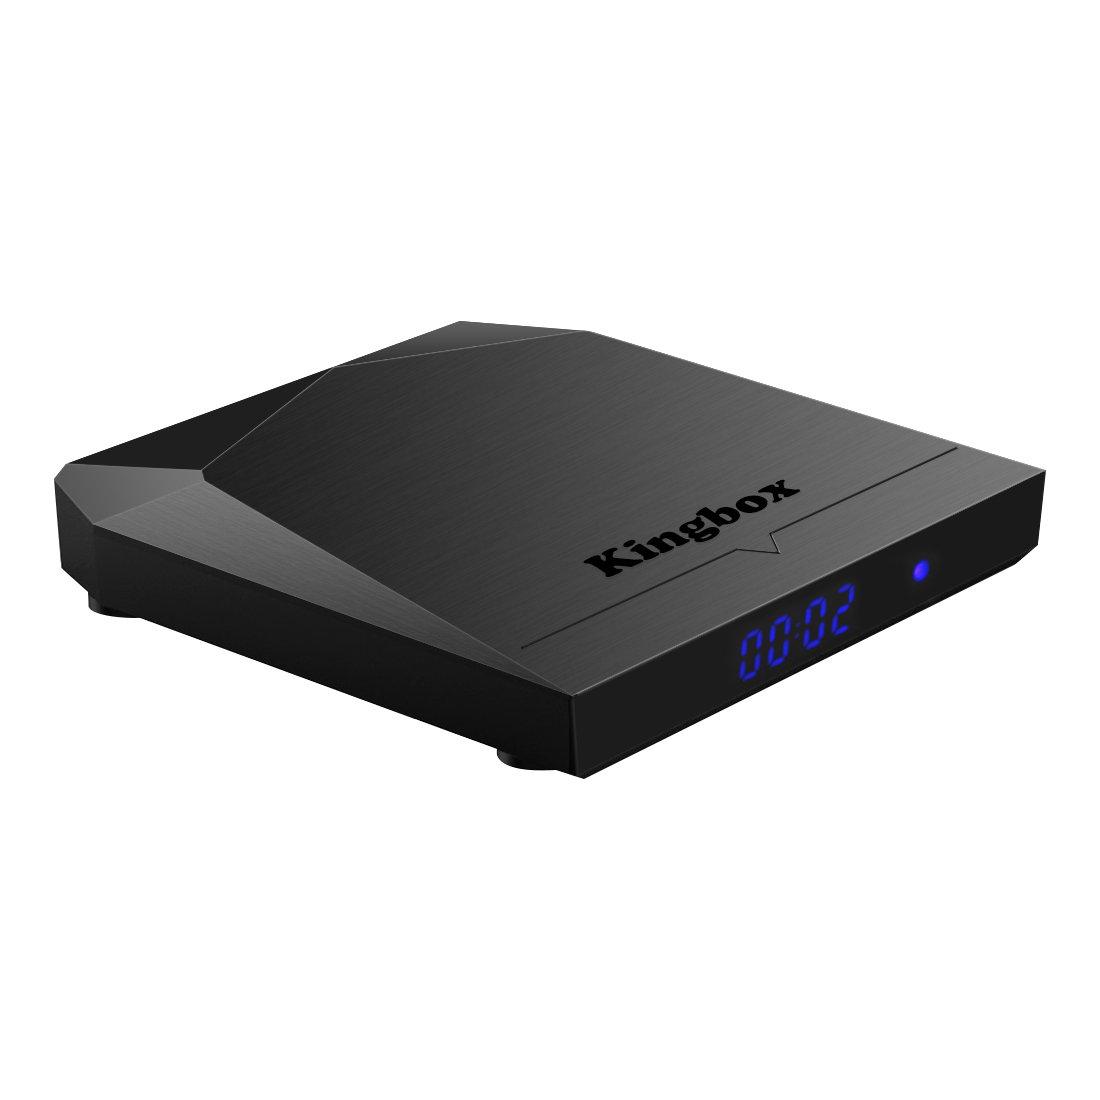 Versión Pura] Kingbox K3 Android TV Box Octa-Core cortex-A53 2GB RAM+16GB ROM LAN 1000M Dual-WIFI 2.4Ghz/5.0Ghz Smart tv box.: Amazon.es: Electrónica